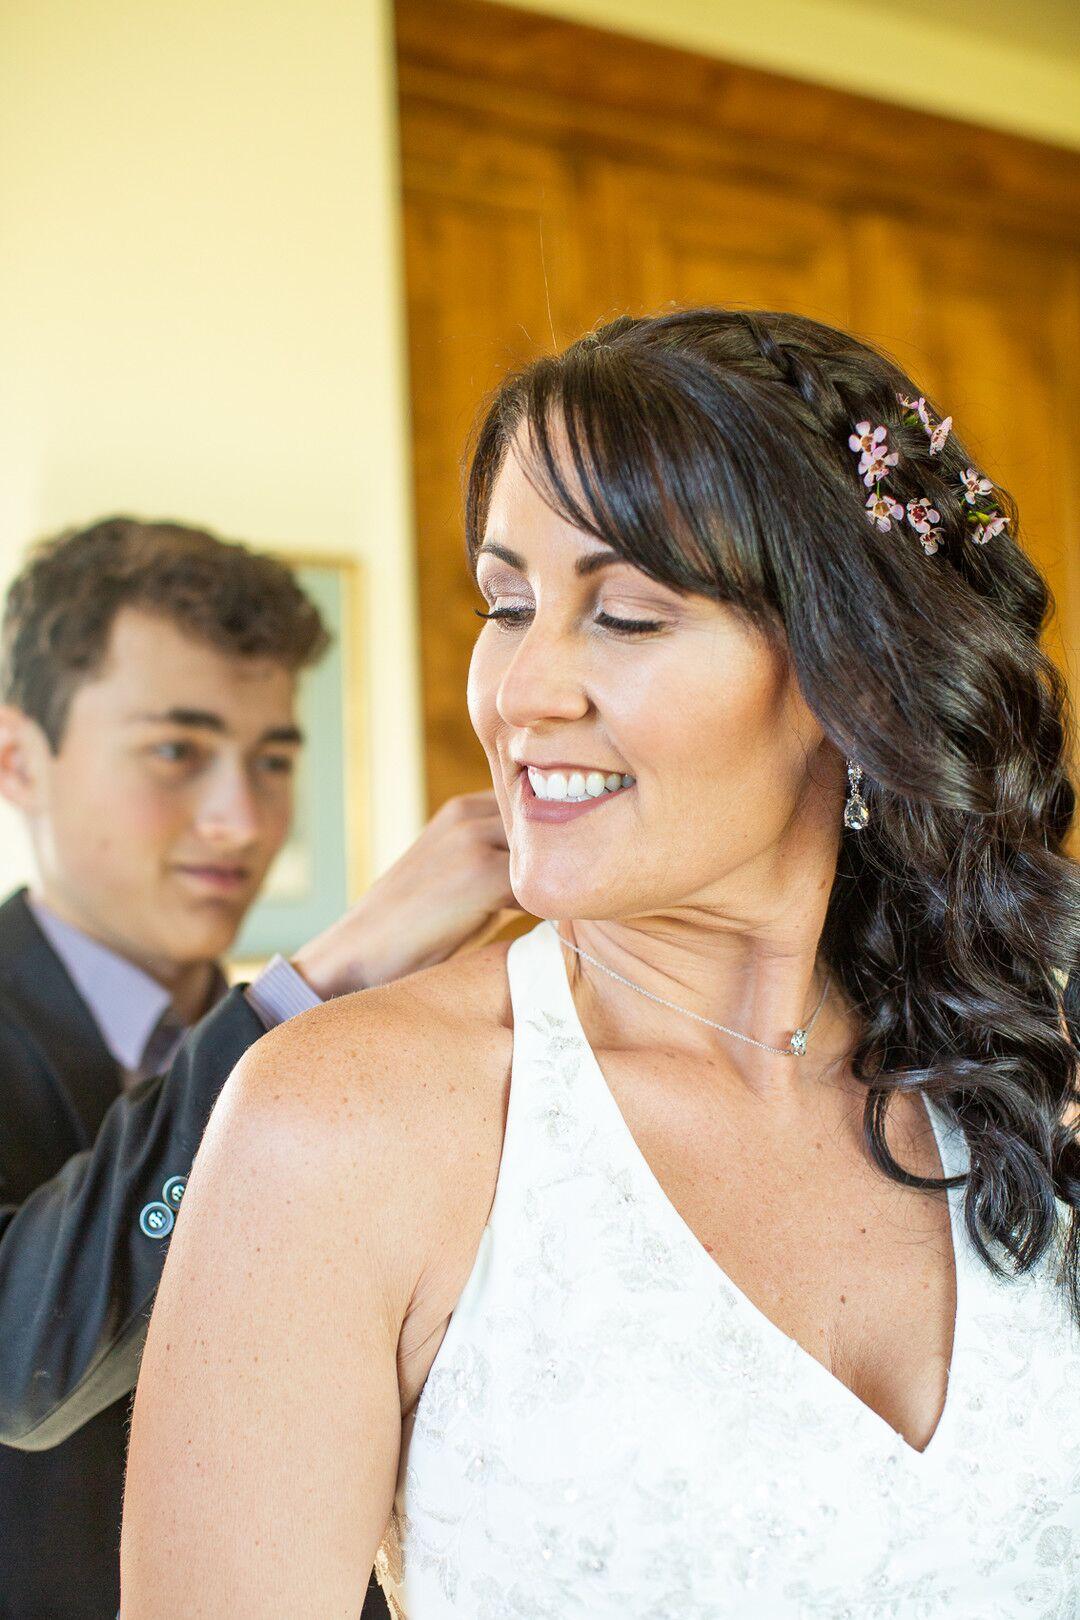 www.santabarbarawedding.com | Venue: The Casitas of Arroyo Grande | Photographer: Renoda Campbell Photography | Second Shooter: John Patrick Images |  Bride Before Wedding